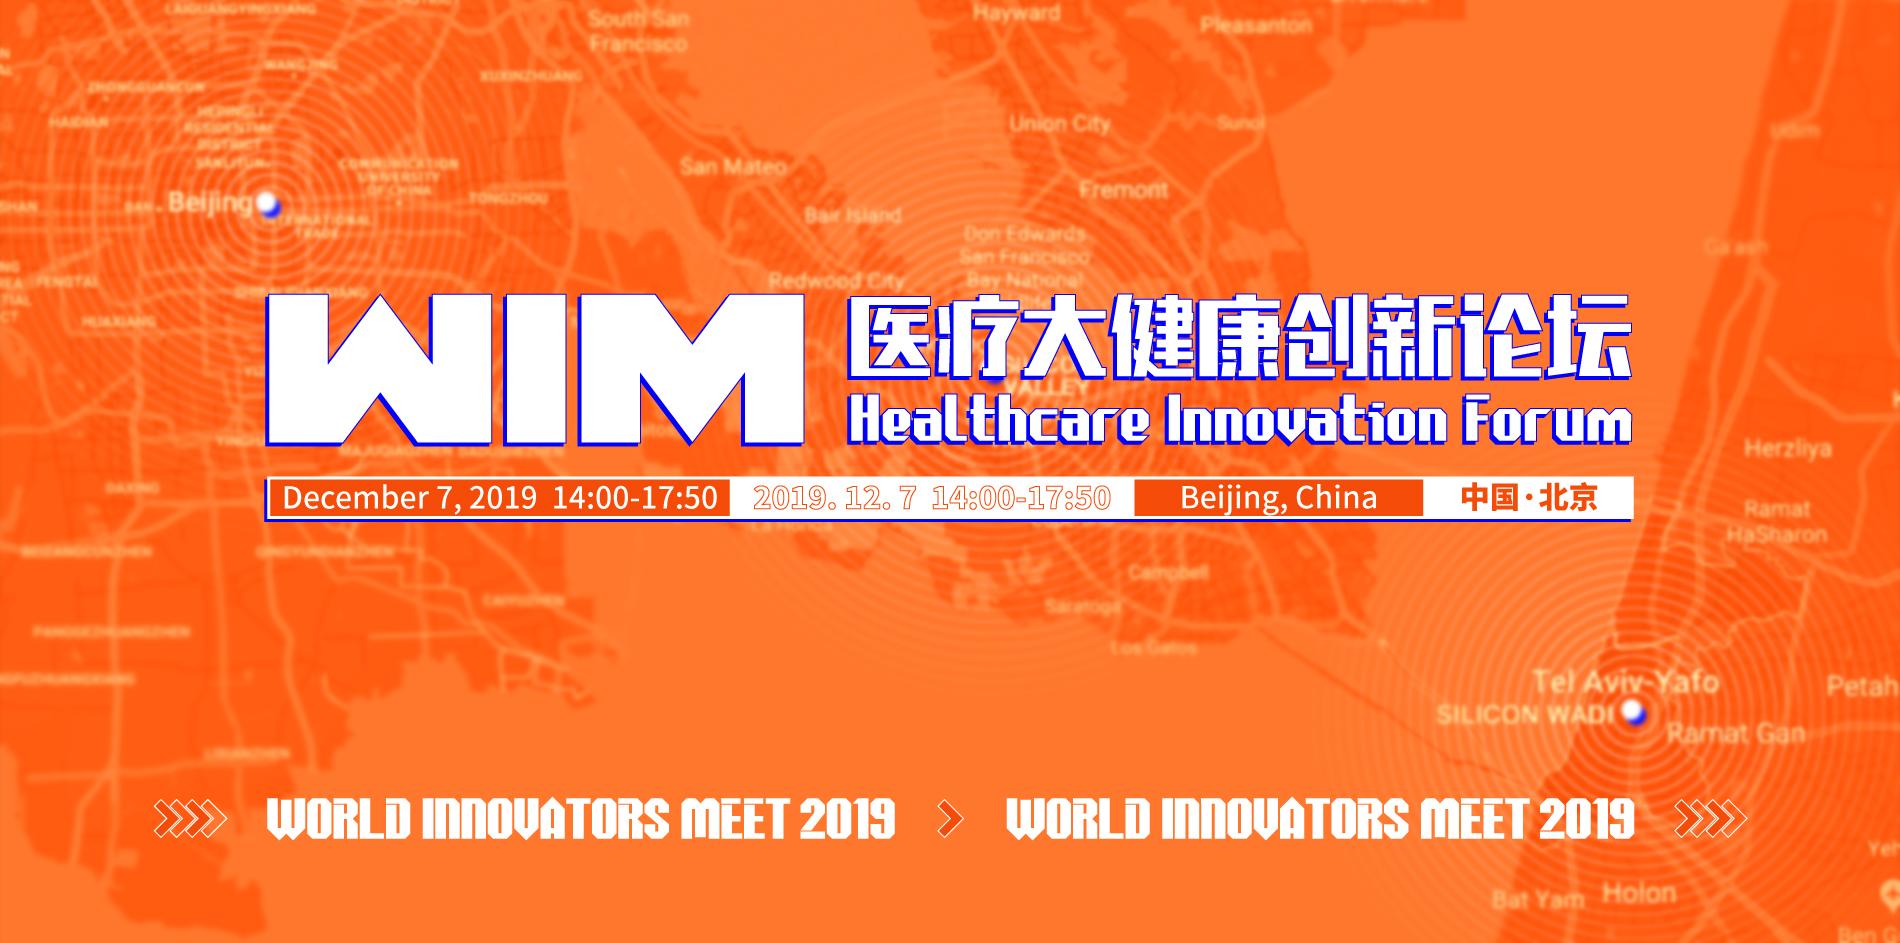 WIM2019 - Healthcare Innovation Forum